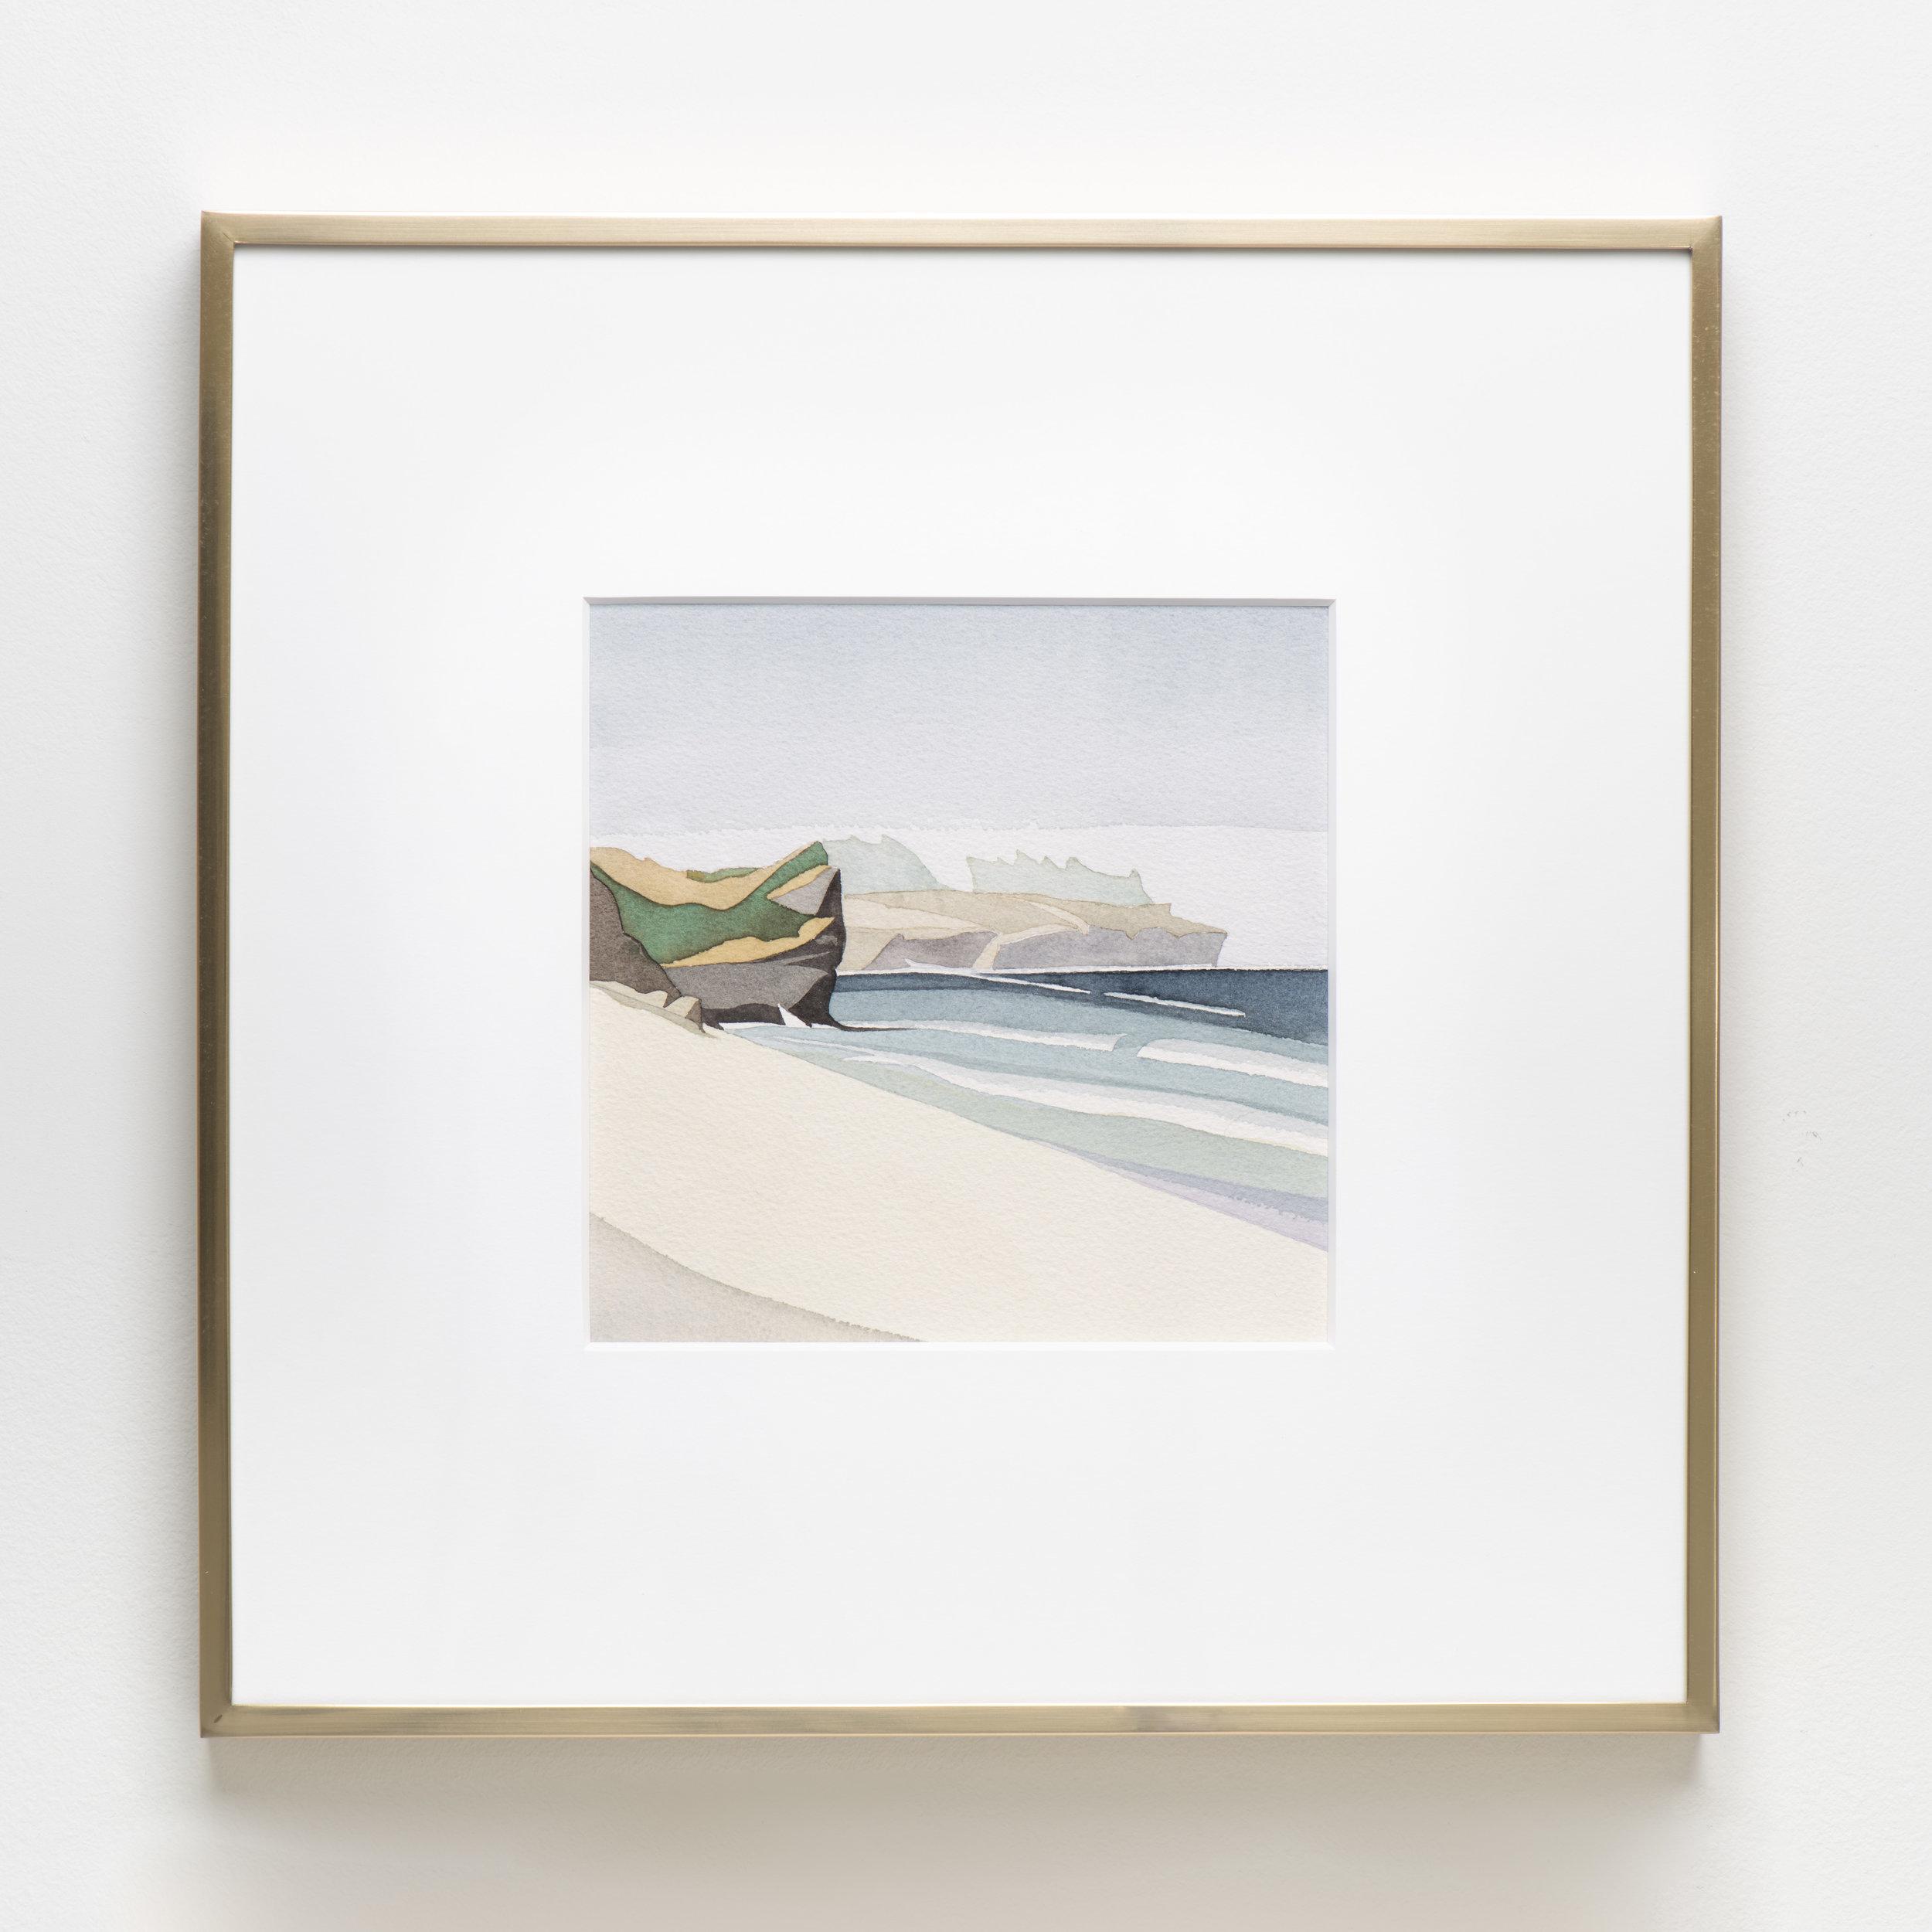 Kilifi Beach , 2018 Watercolor on paper 15 7/8 x 15 7/8 inches